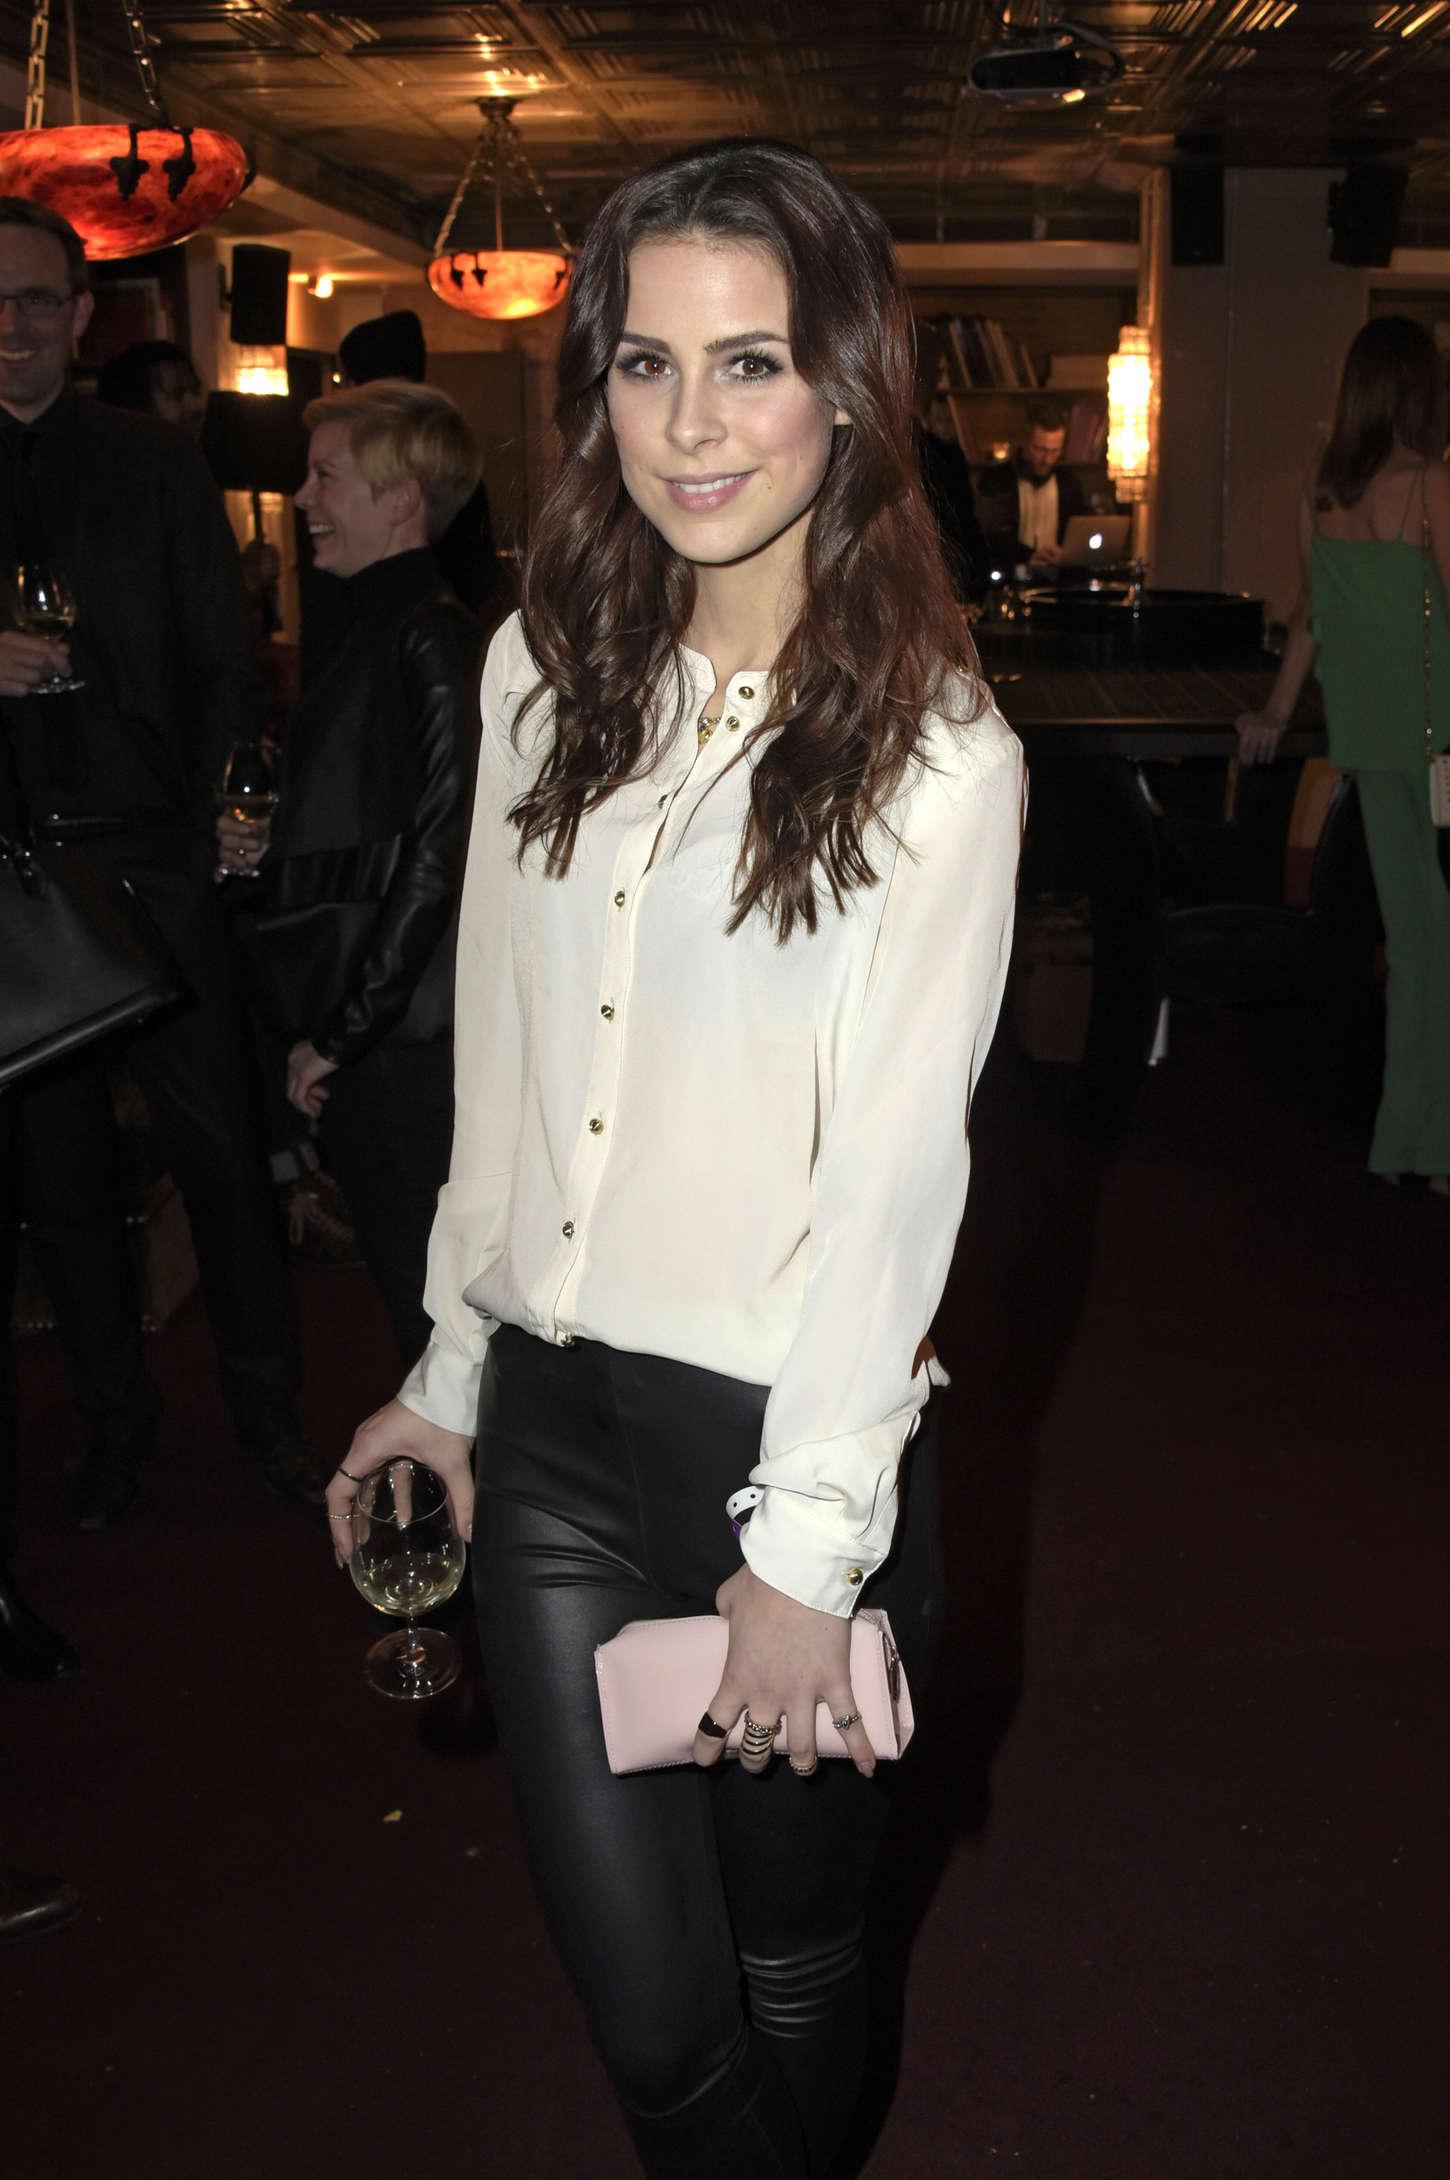 Lena Meyer Landrut Marc Cain Fashion Show In Berlin Celebrity Wiki Onceleb Wiki